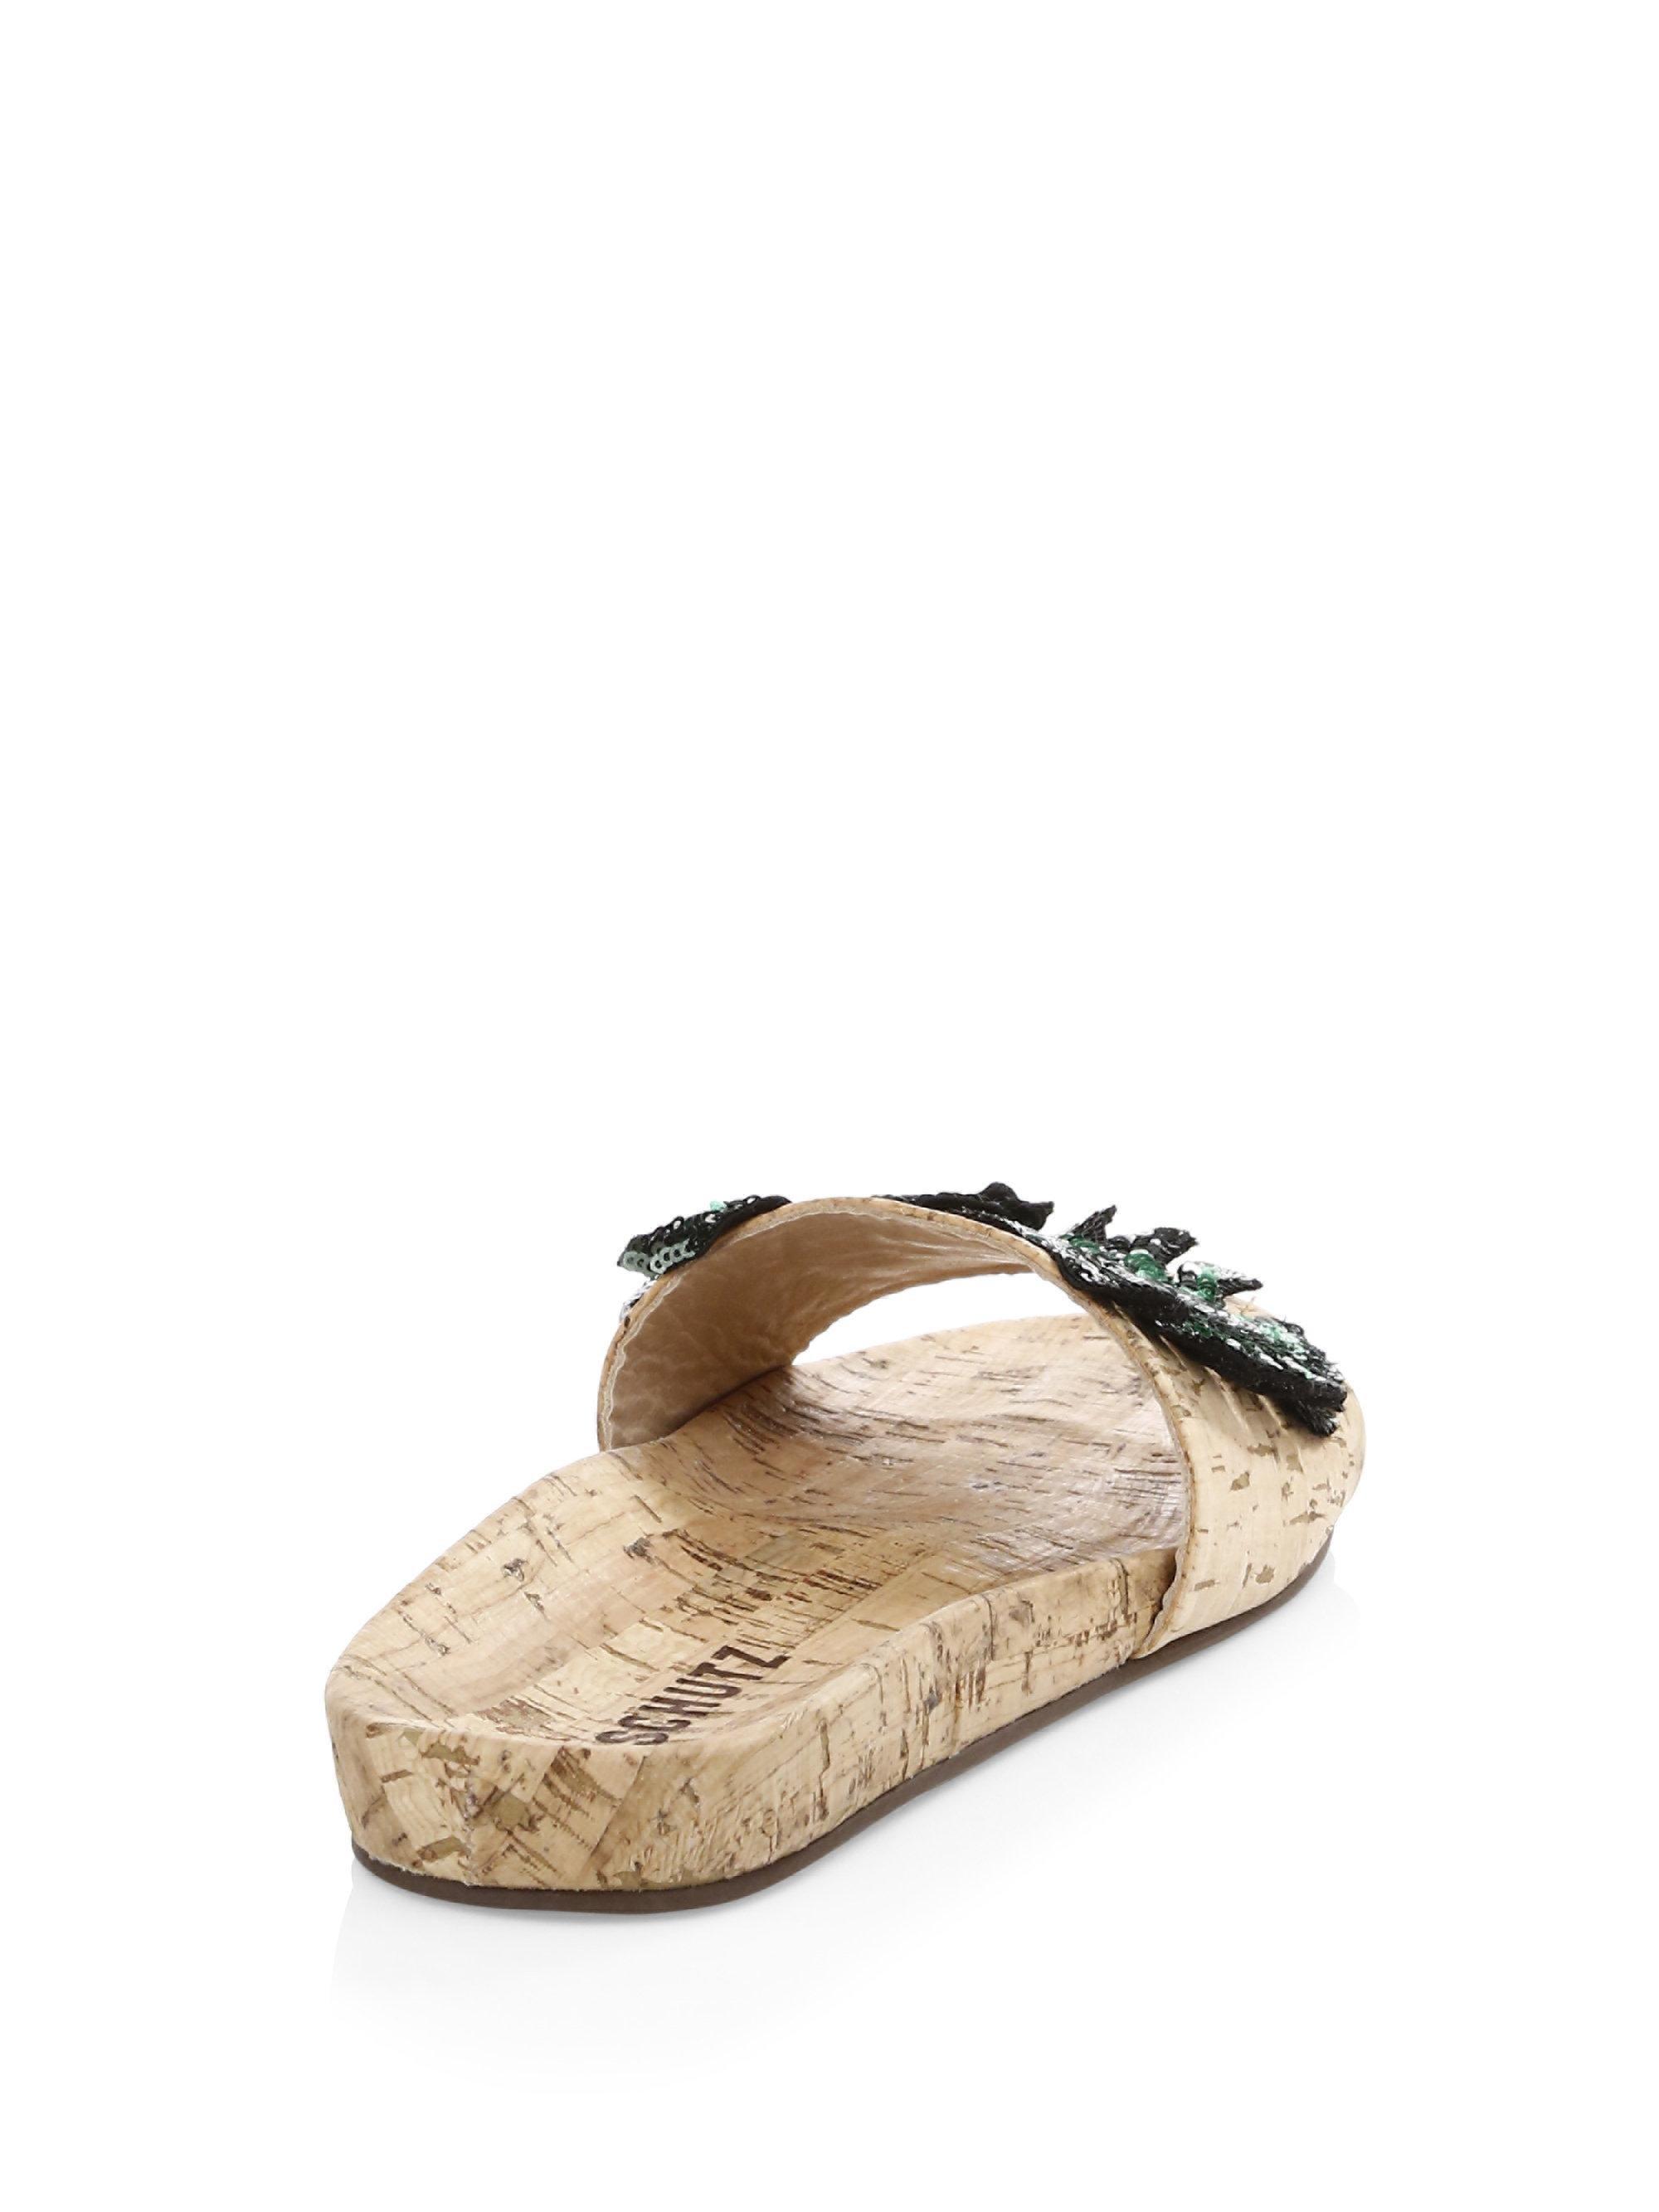 Schutz Leeya Sequin Cork Slides qHJecXHV8v